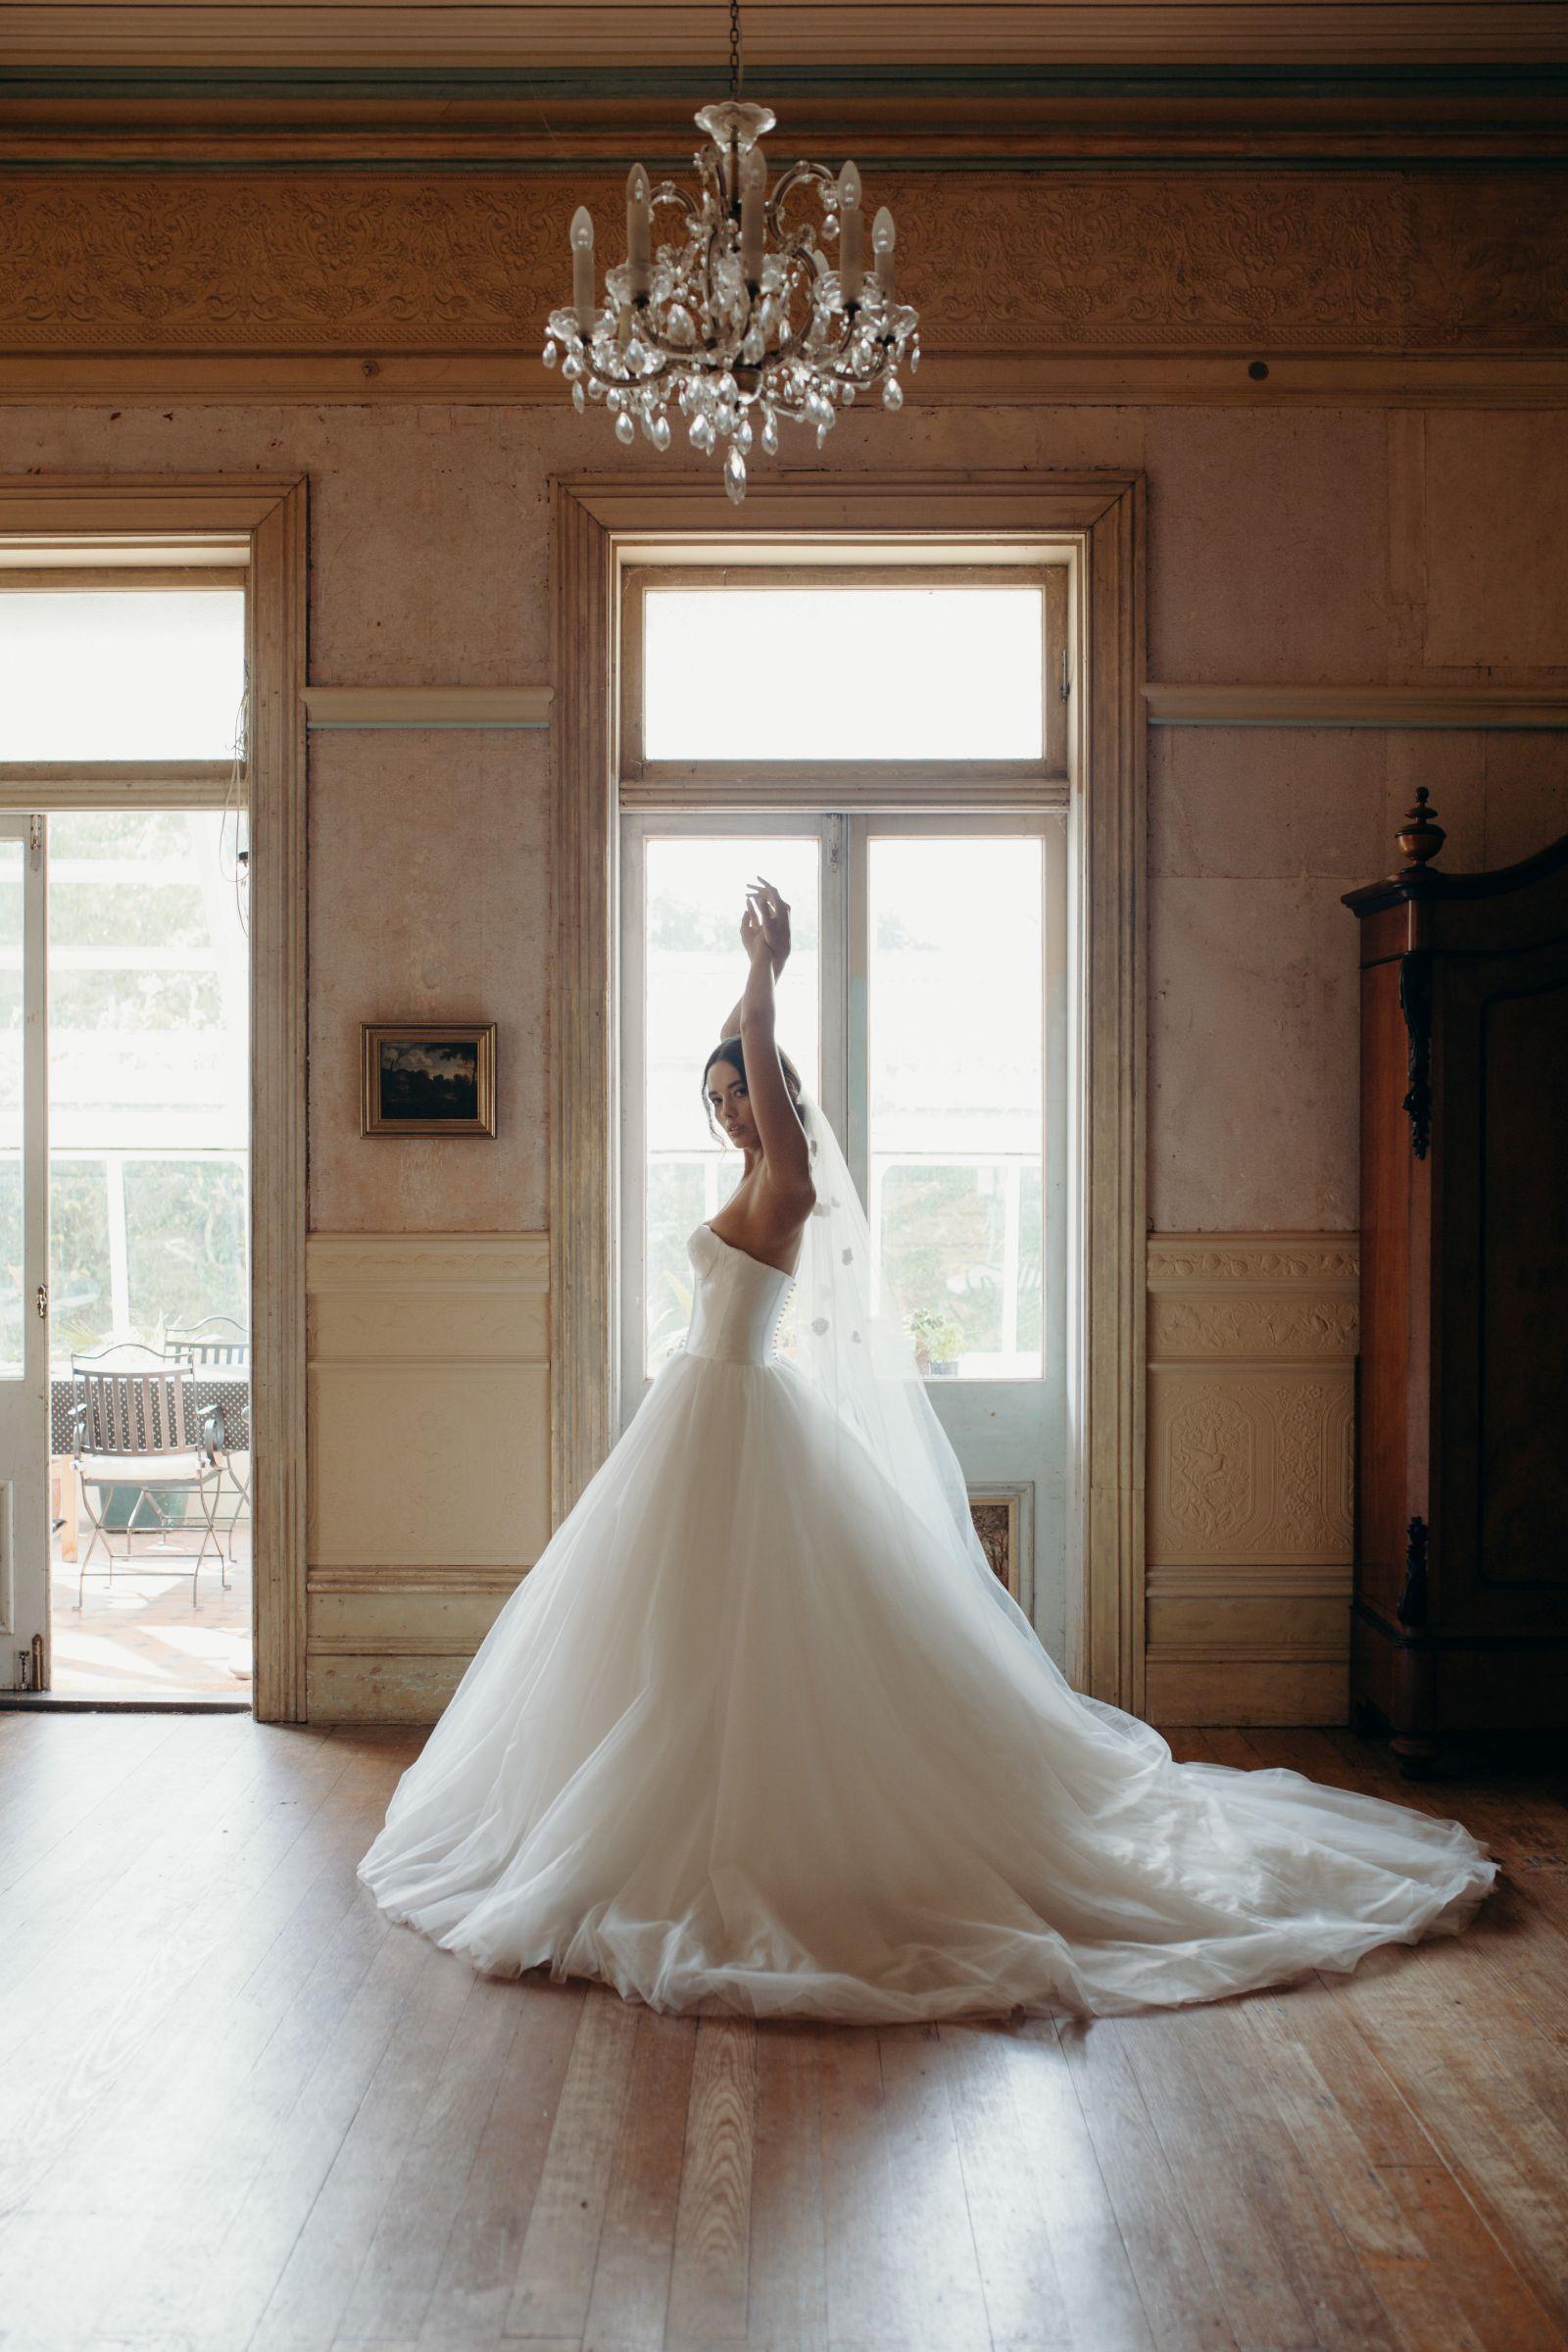 Hera Florence Wedding Dress Manor_Portrait 5M1A5782